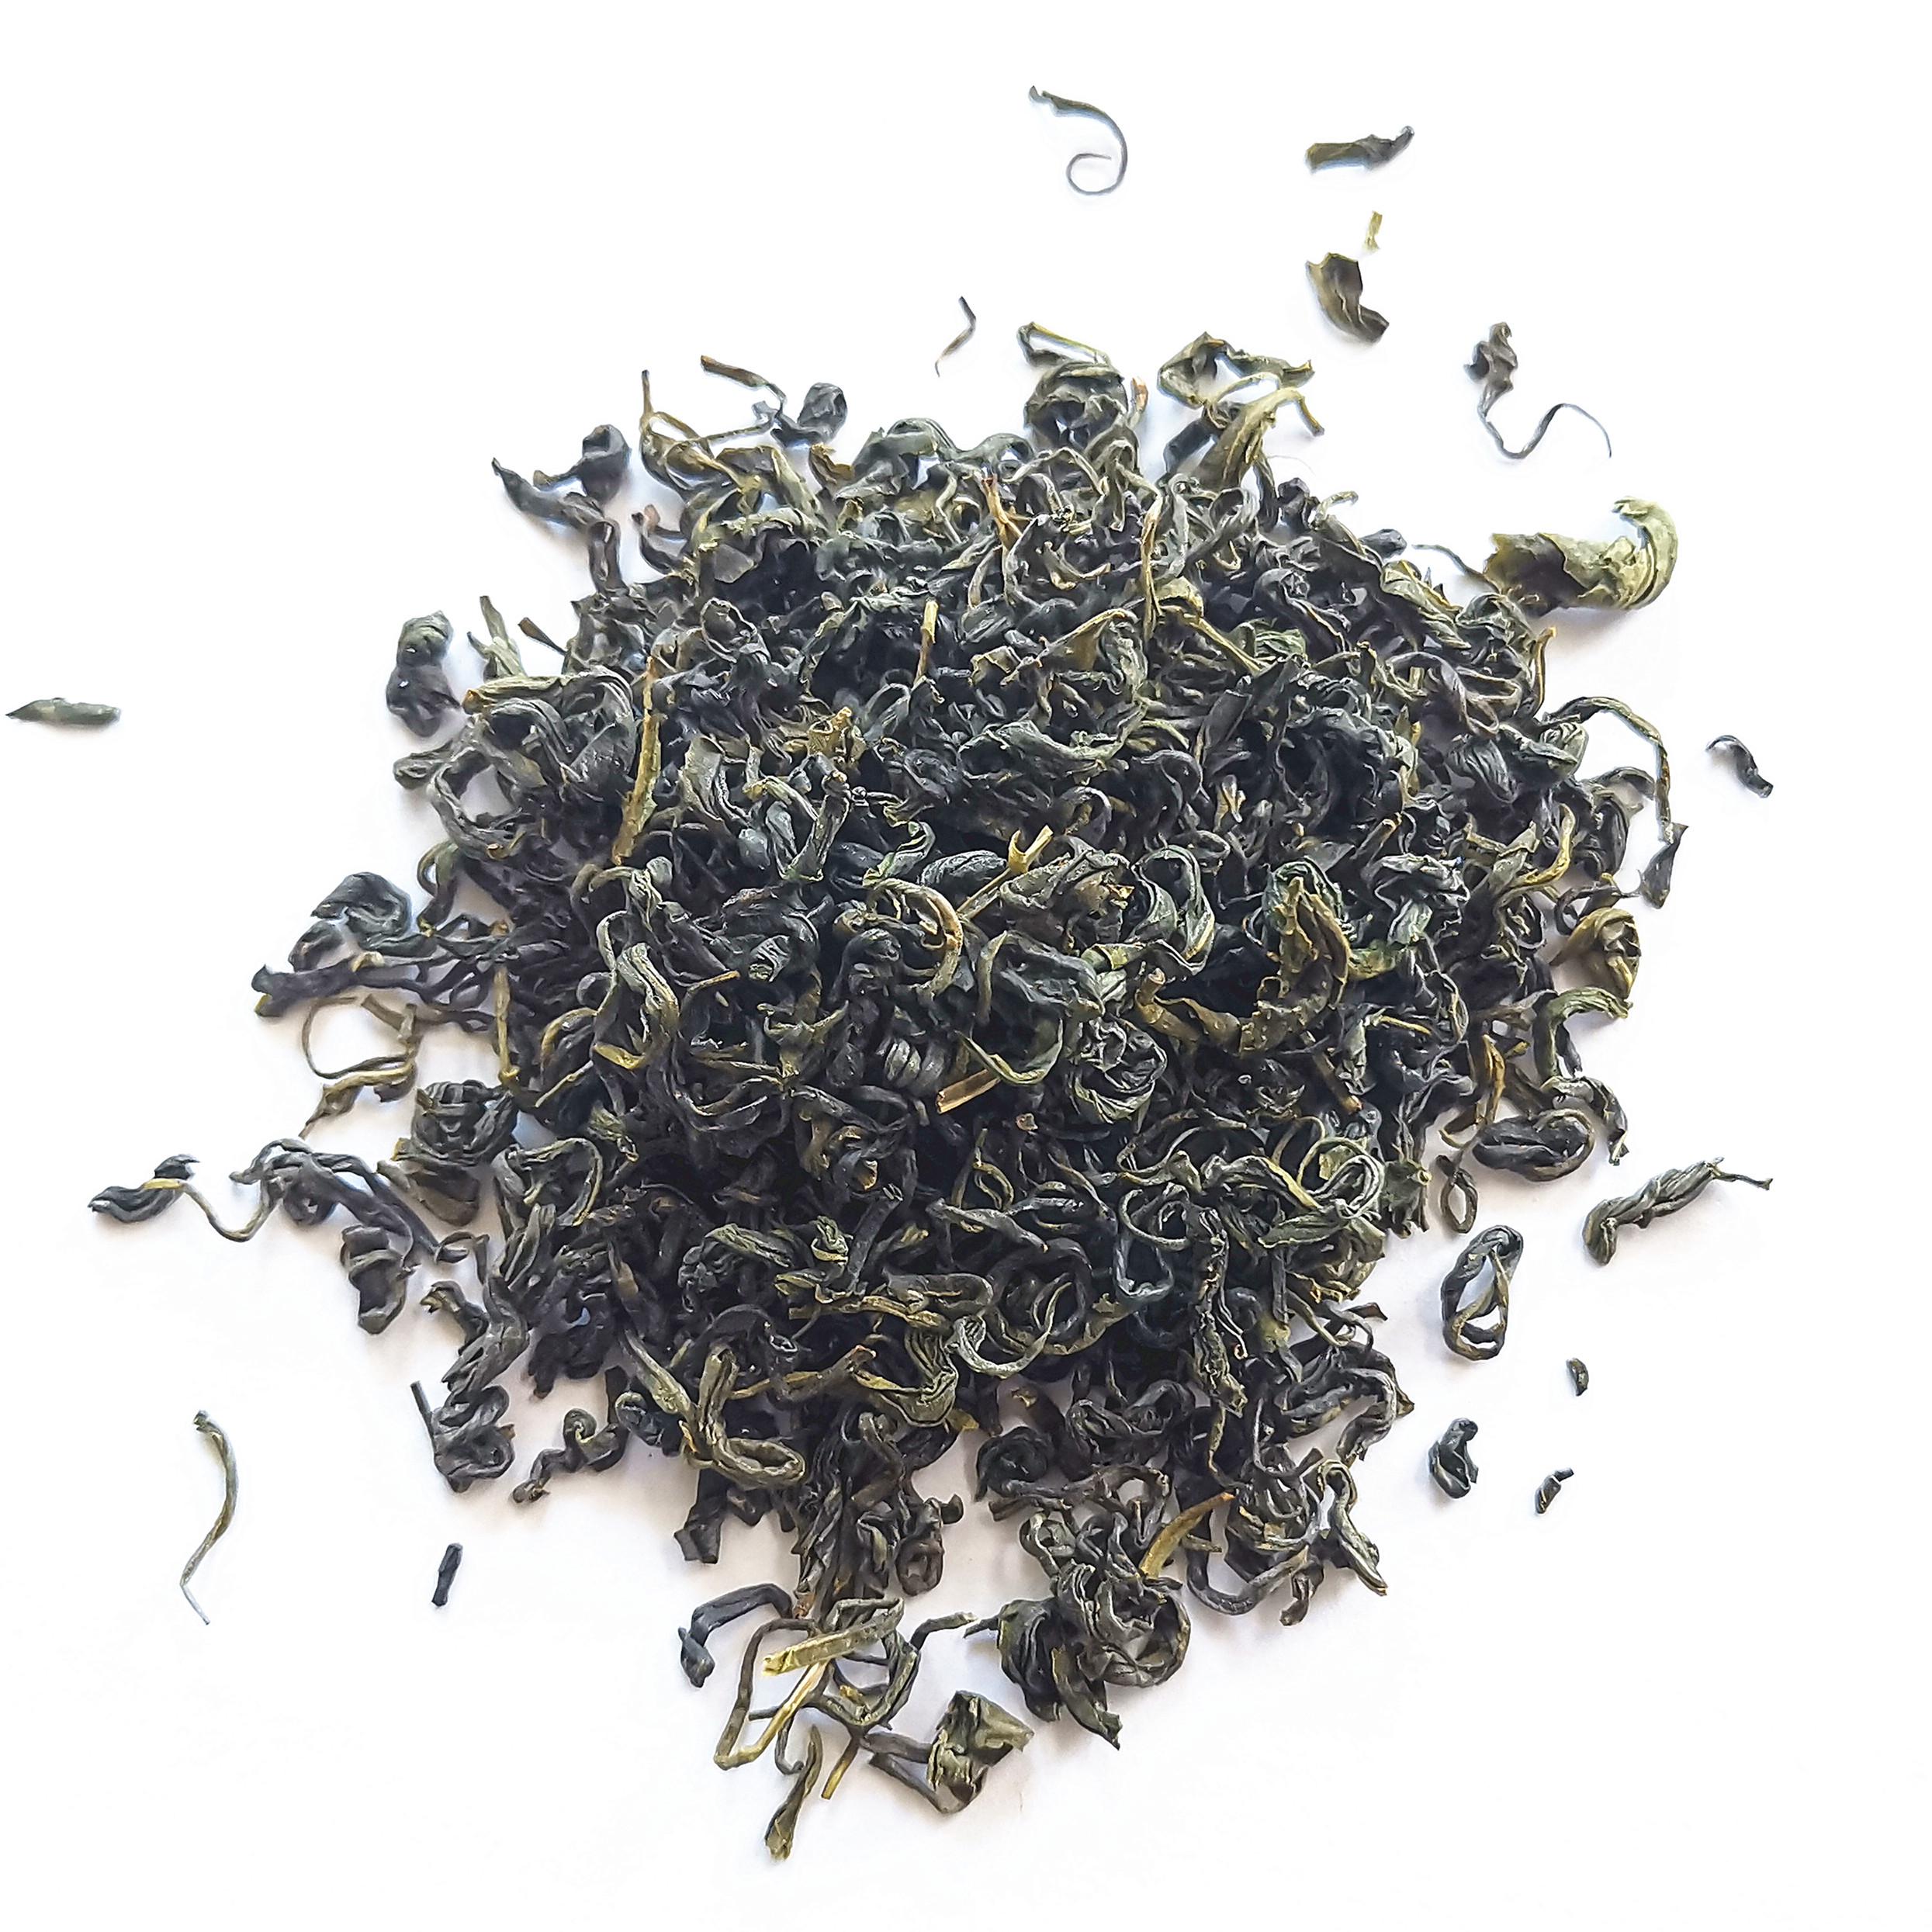 Online tea shopping green tea infusion gold tea green - 4uTea | 4uTea.com